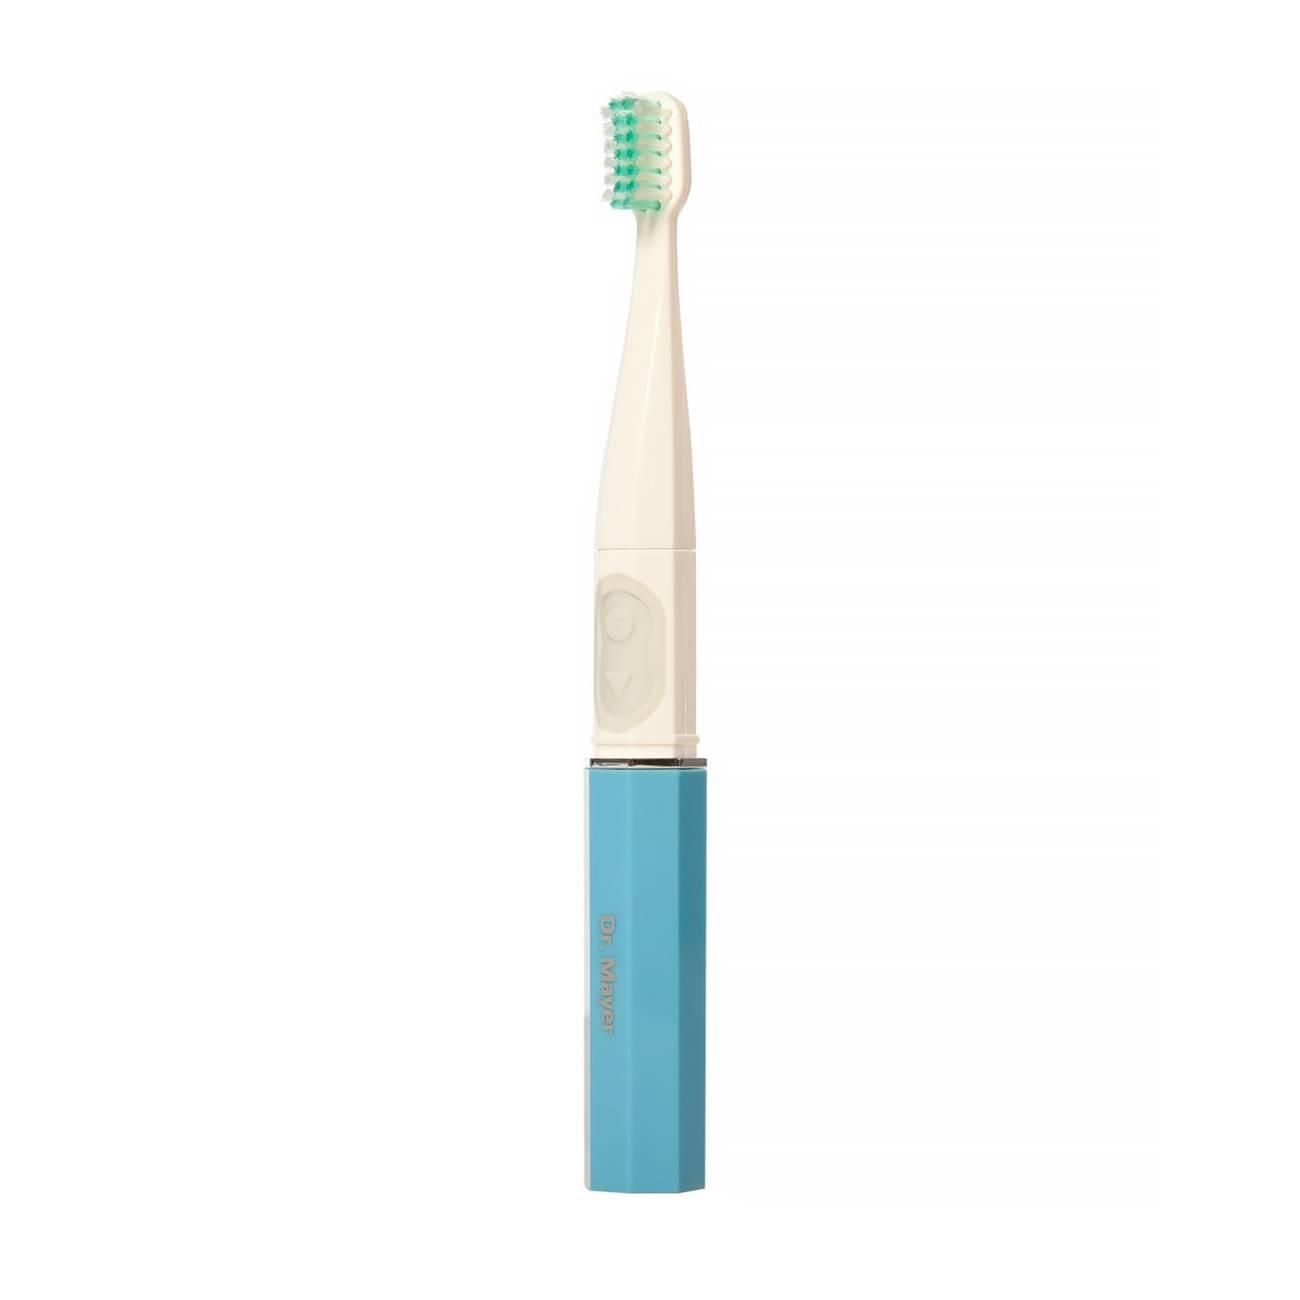 Gts2005tbl Travel Sonic Toothbrush Blue Dr. Mayer imagine 2021 bestvalue.eu